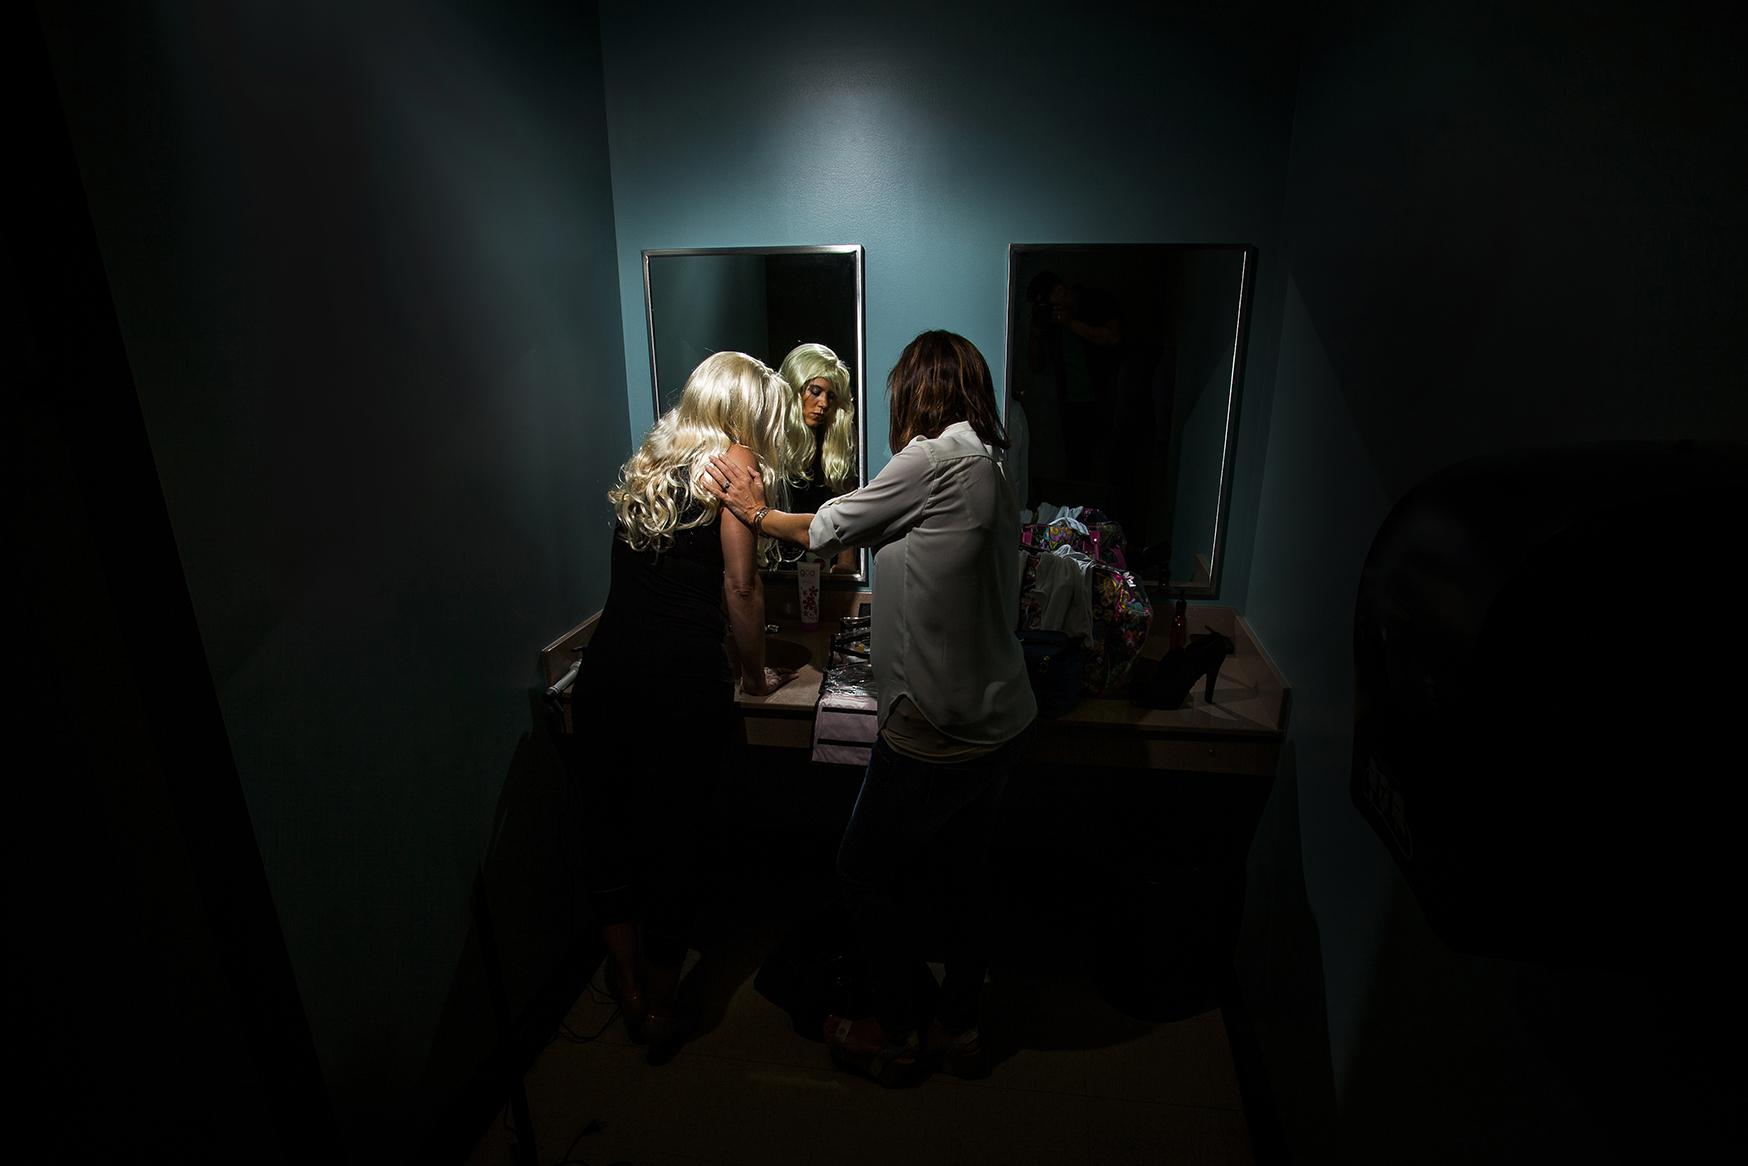 Waken 514 Revolution Stripper Photo Story